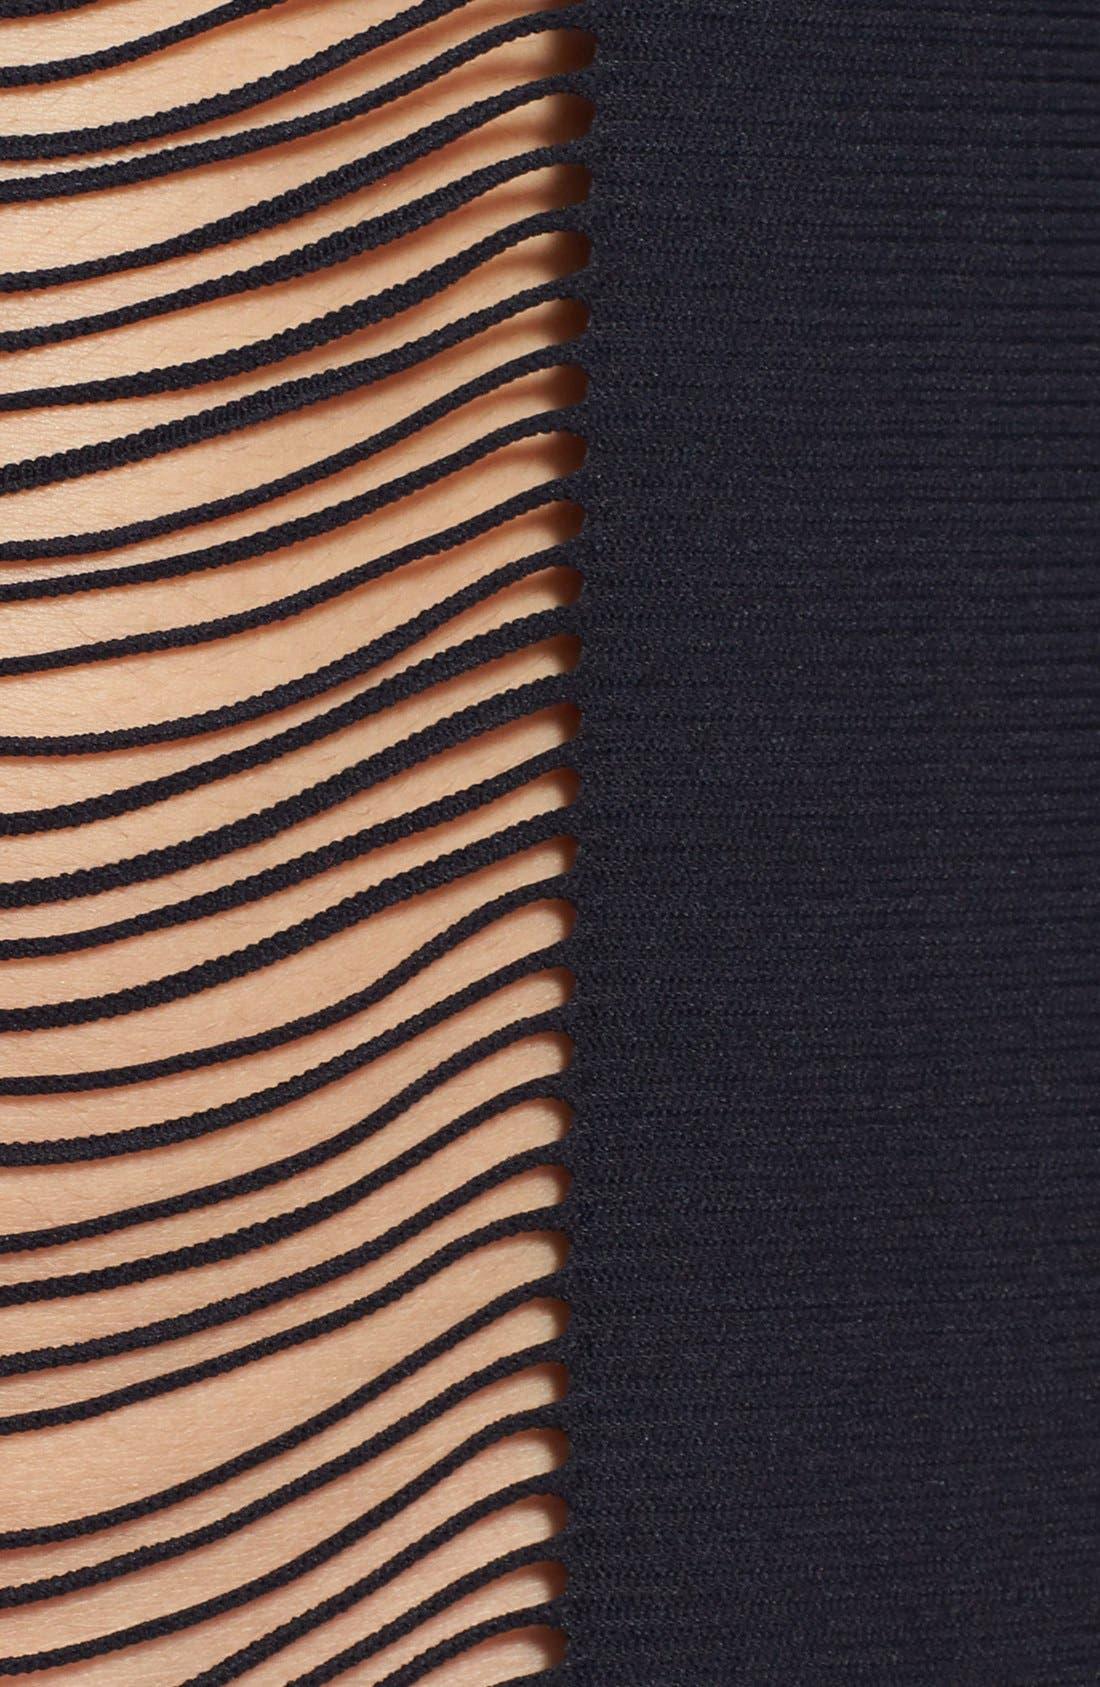 Alternate Image 3  - PilyQ 'Monique' Shredded Fringe Cover-Up Poncho